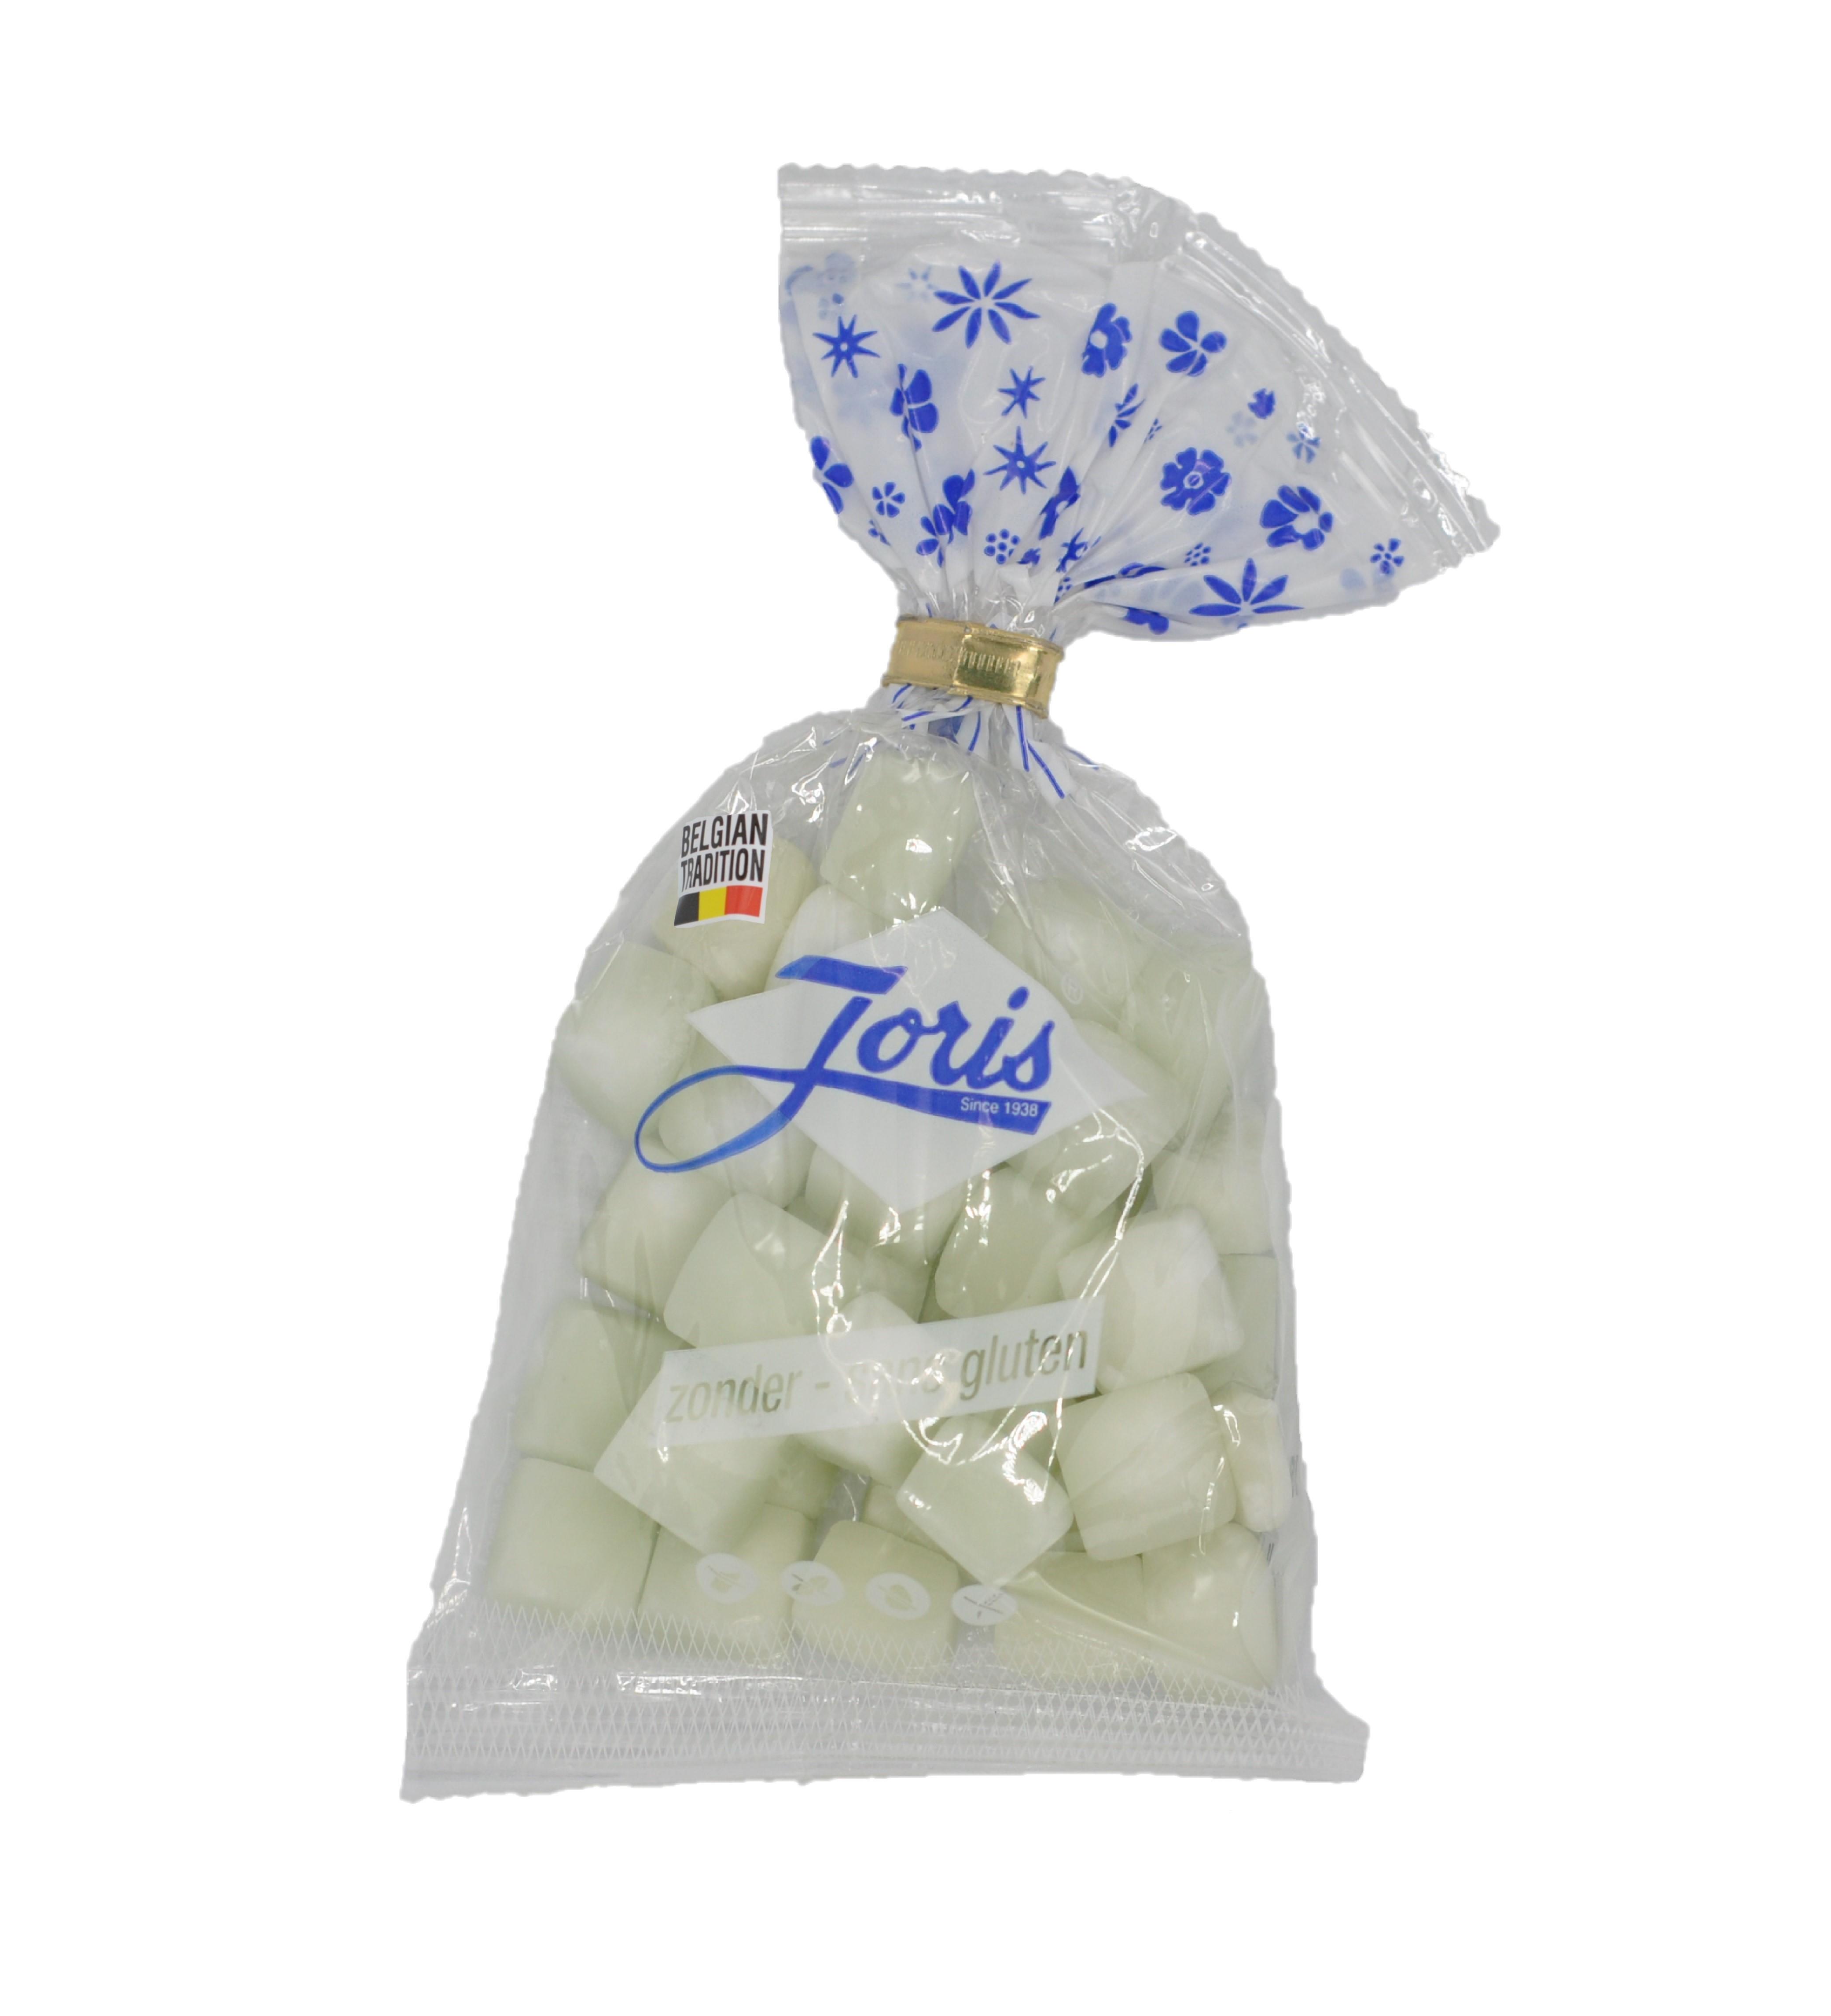 Bonbons Carrés de menthe en sachet, Joris (130 g)